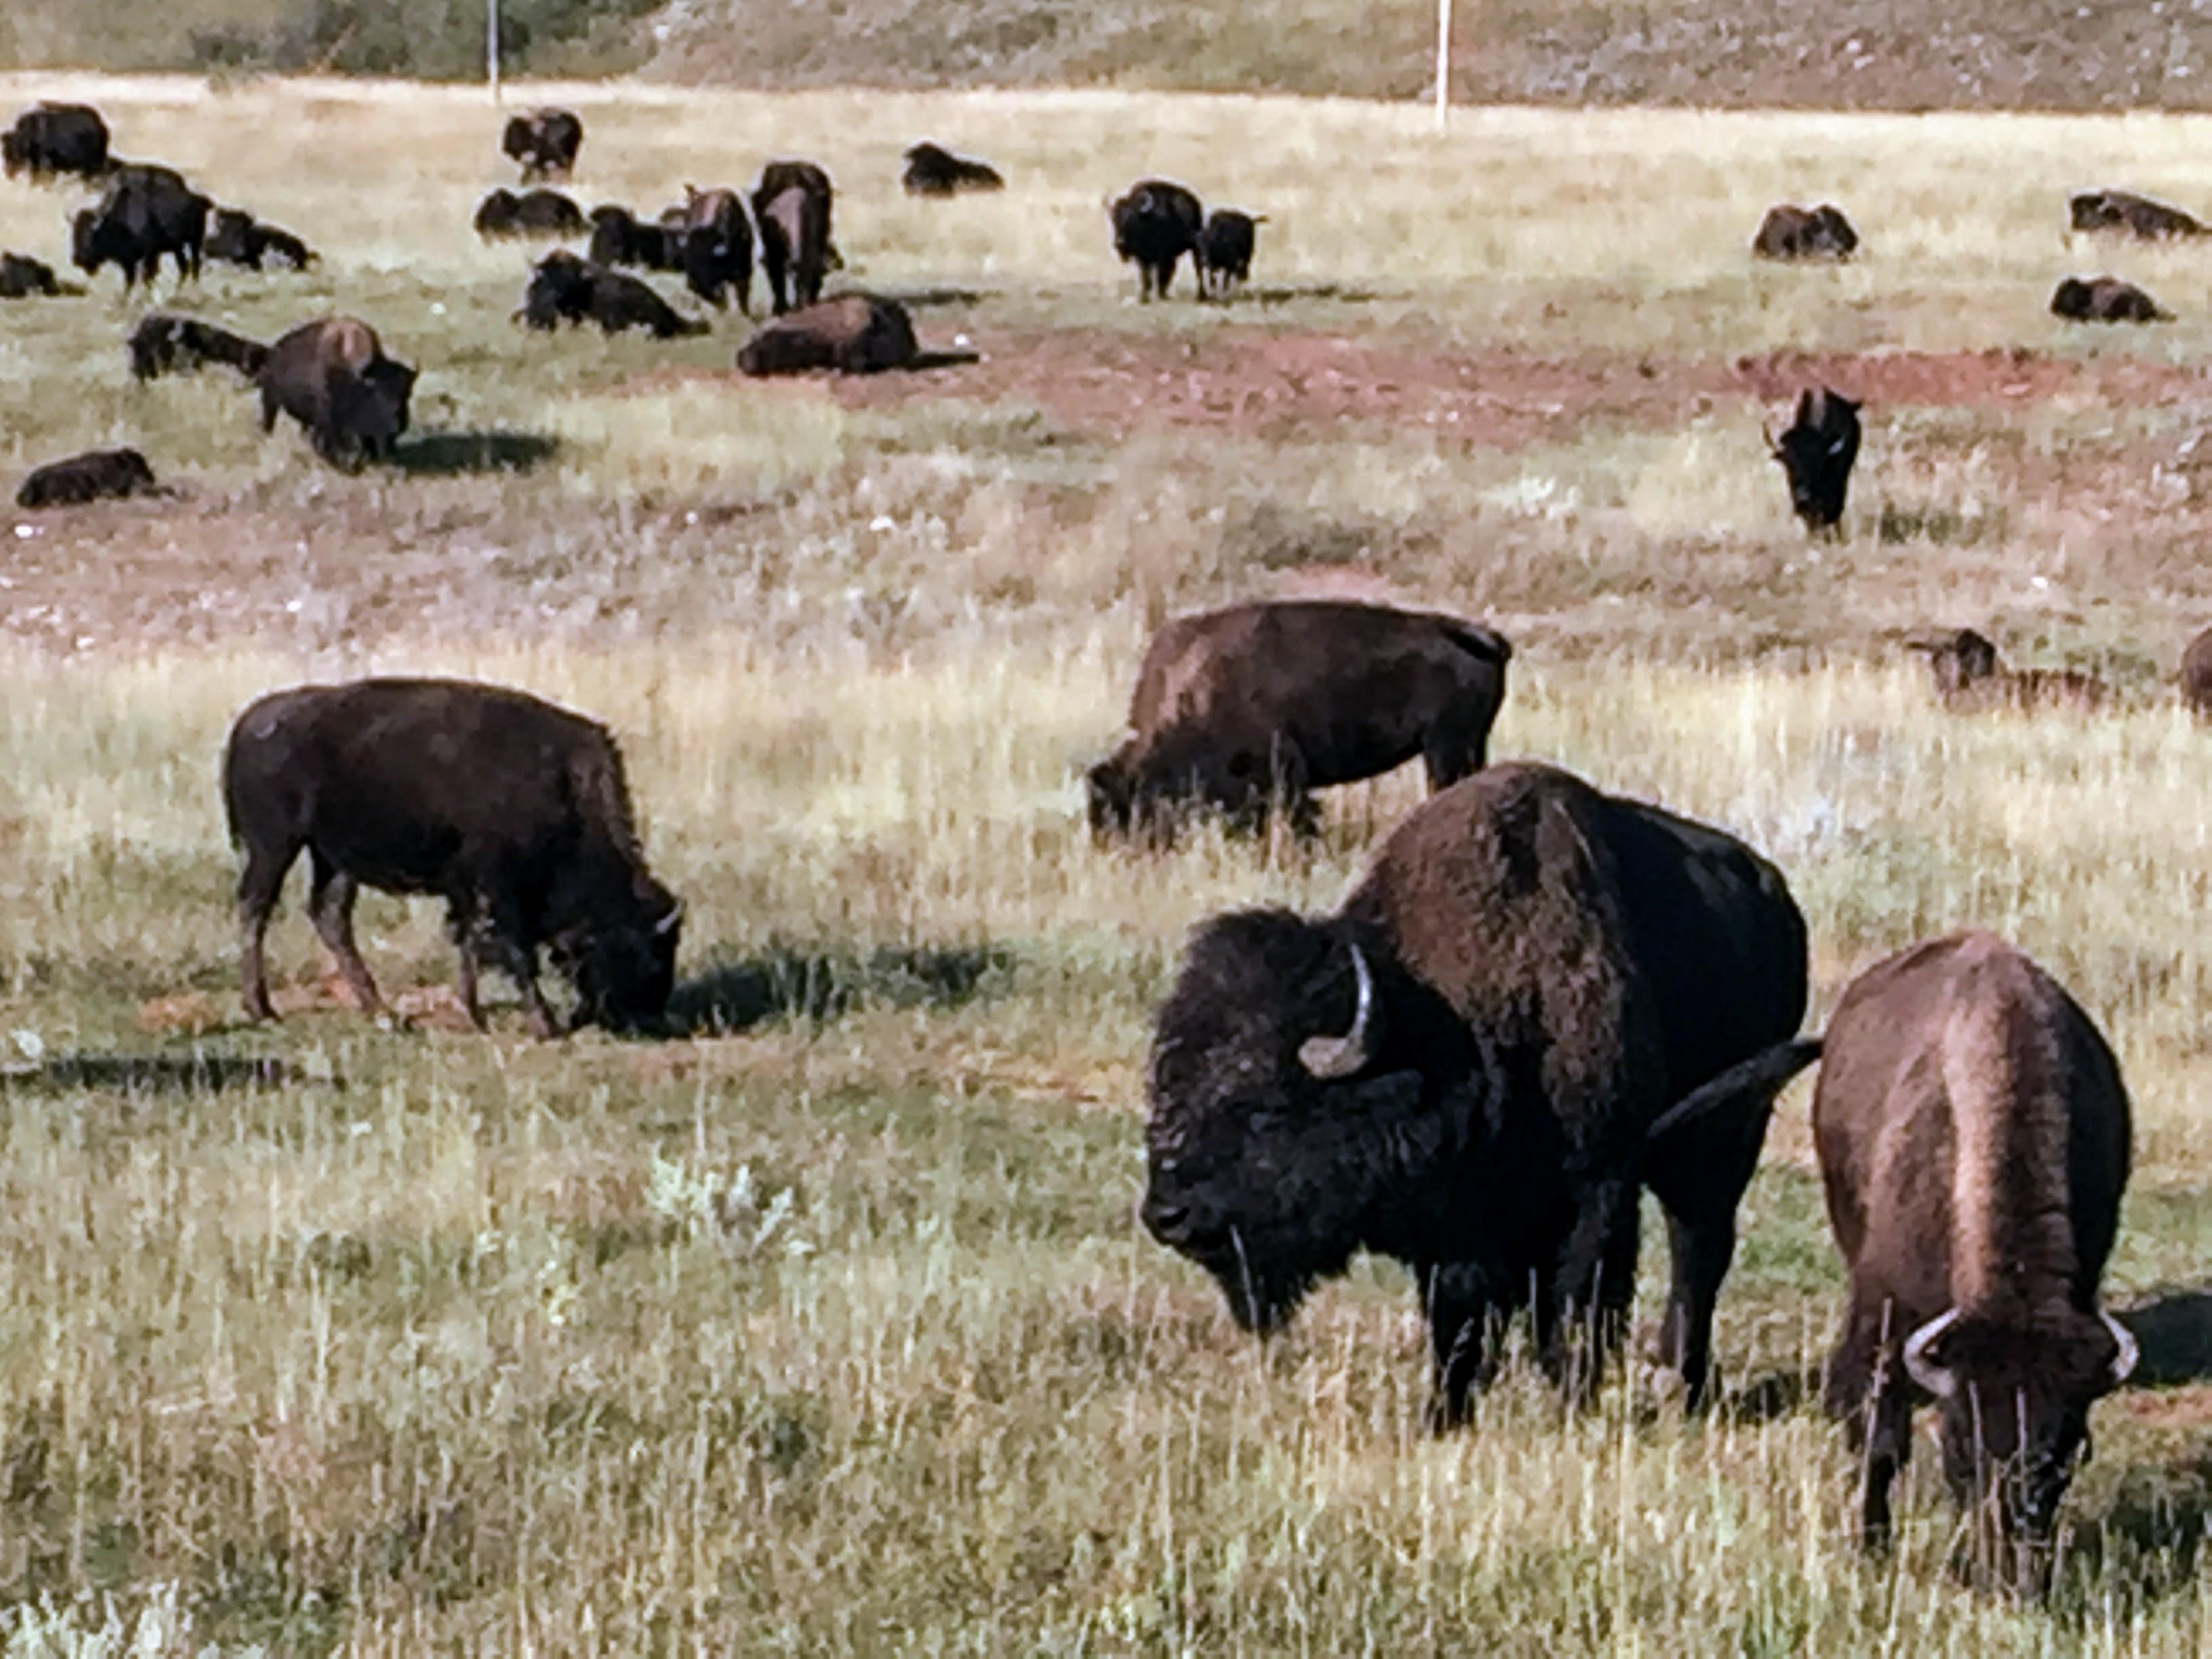 2017-09-17 Black Hills 31 Custer Wildlife 06 Bison